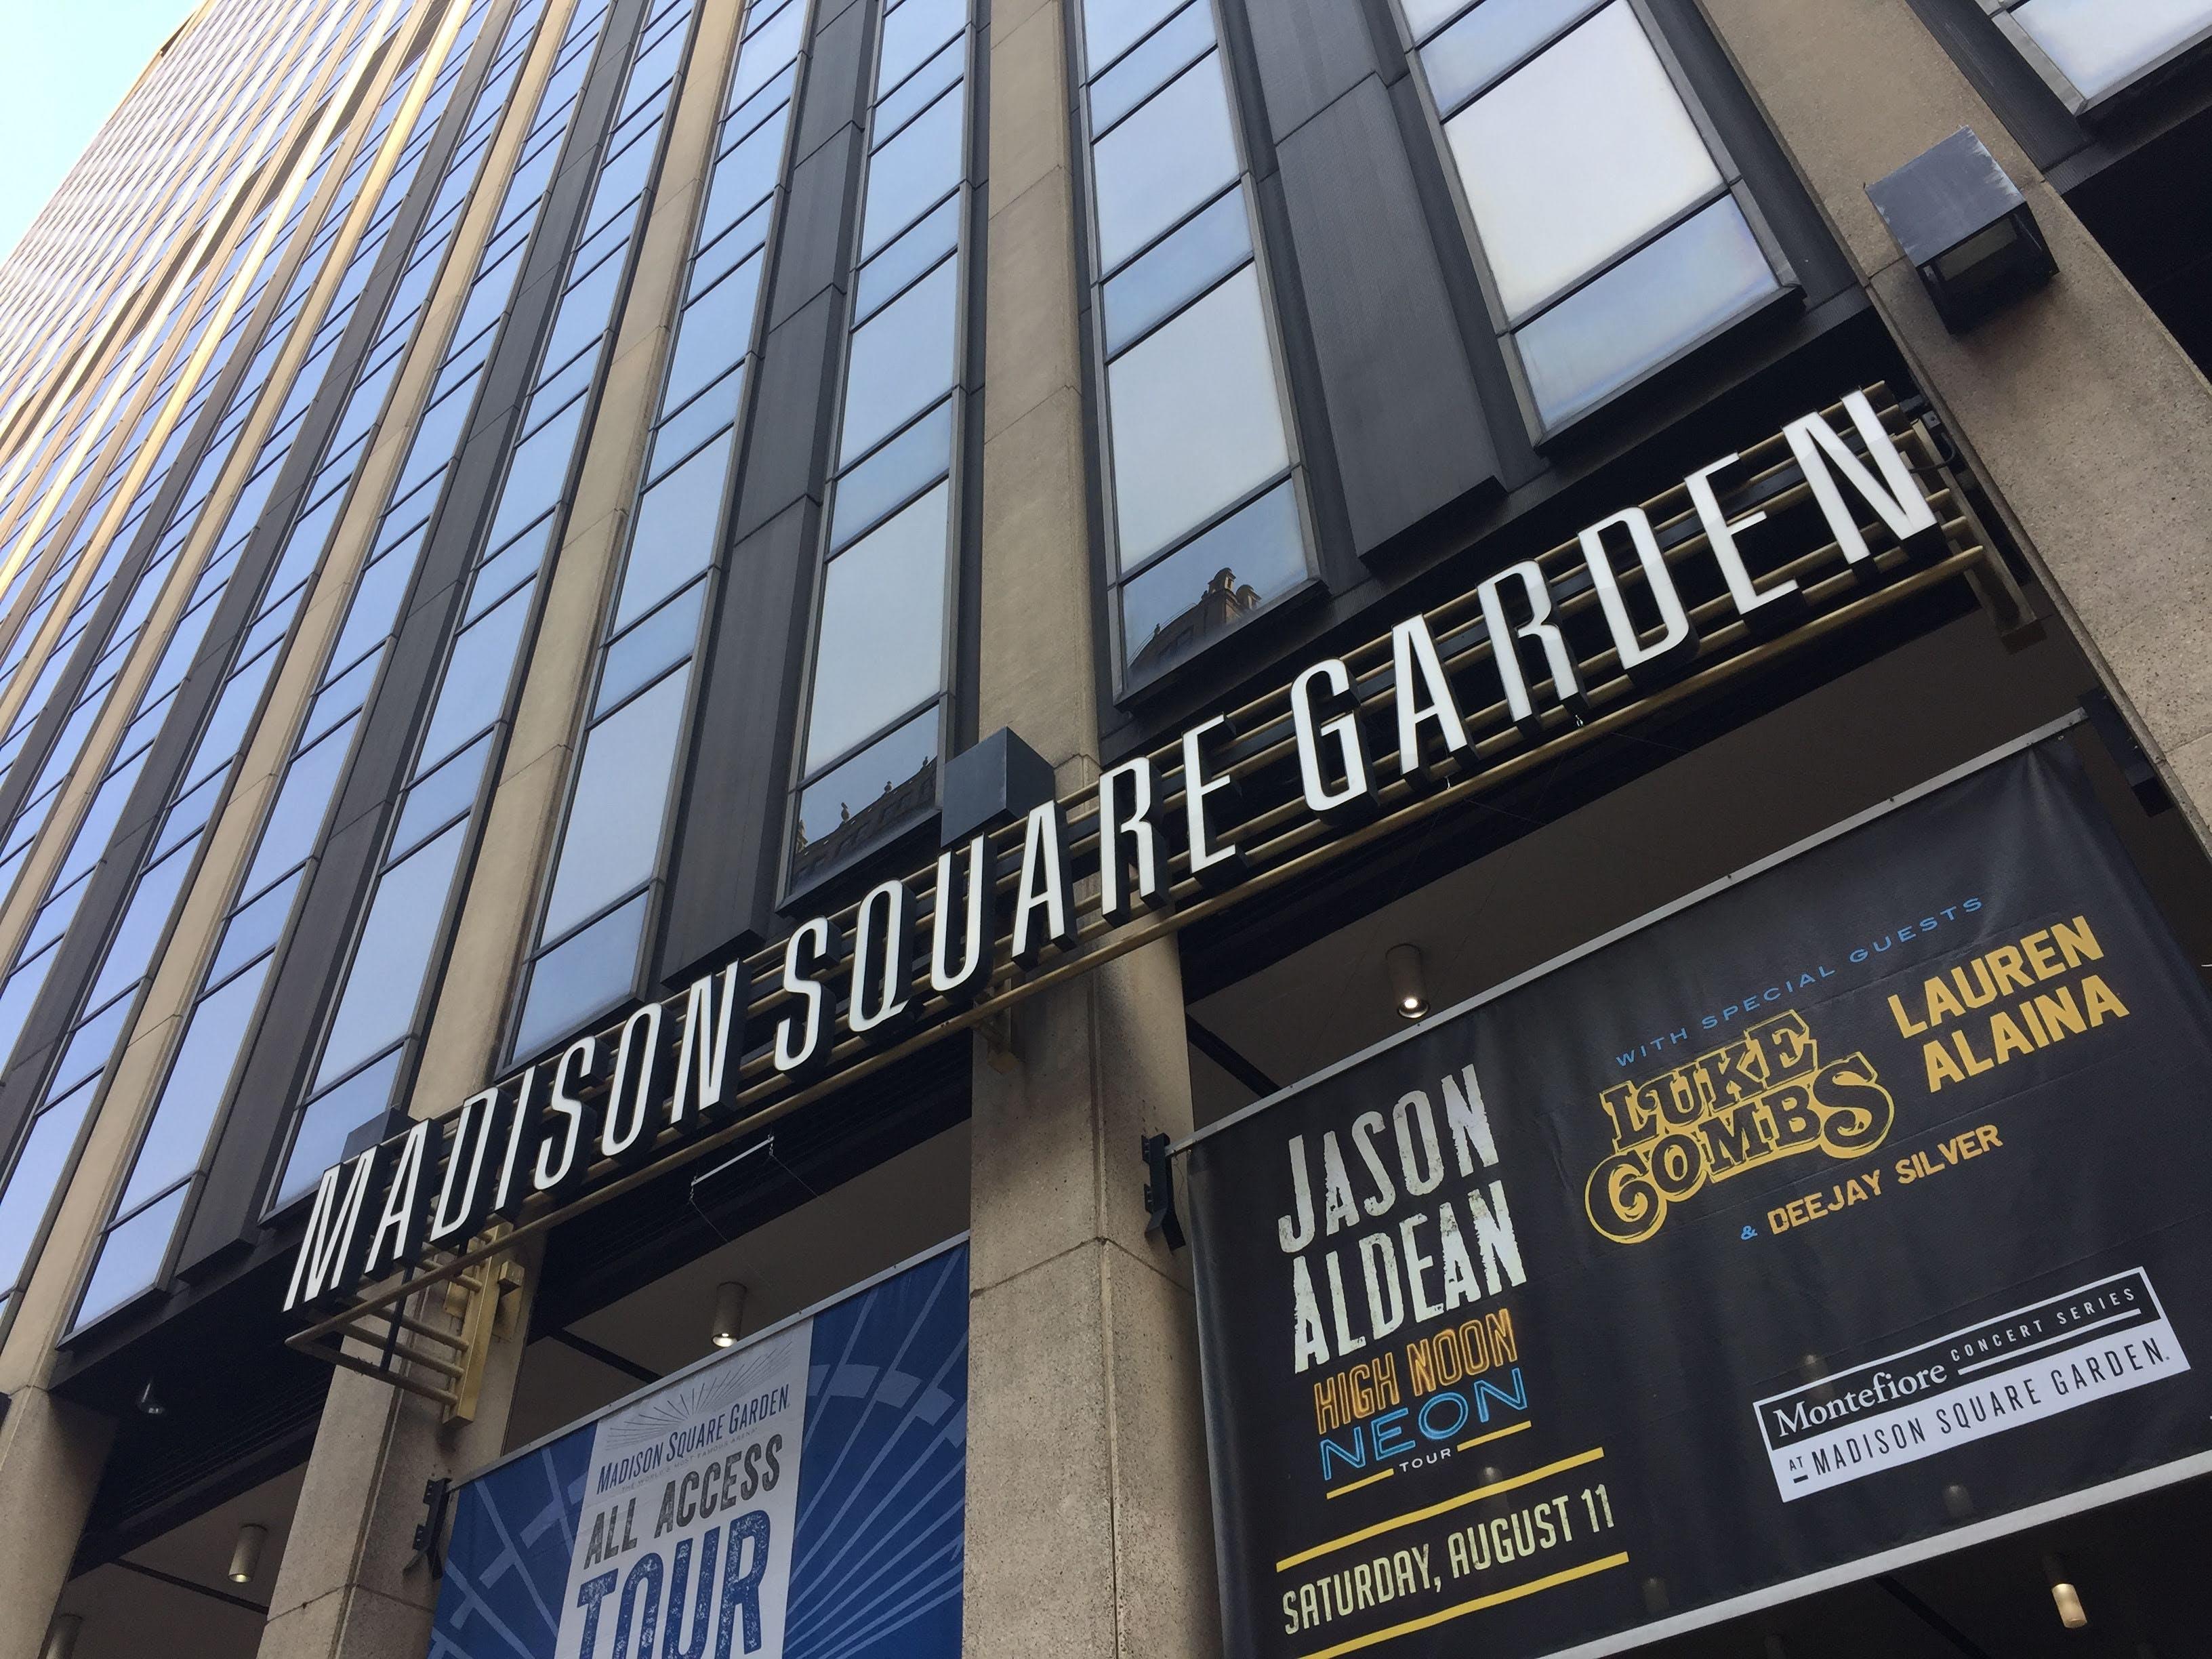 Free stock photo of Madison Square Garden